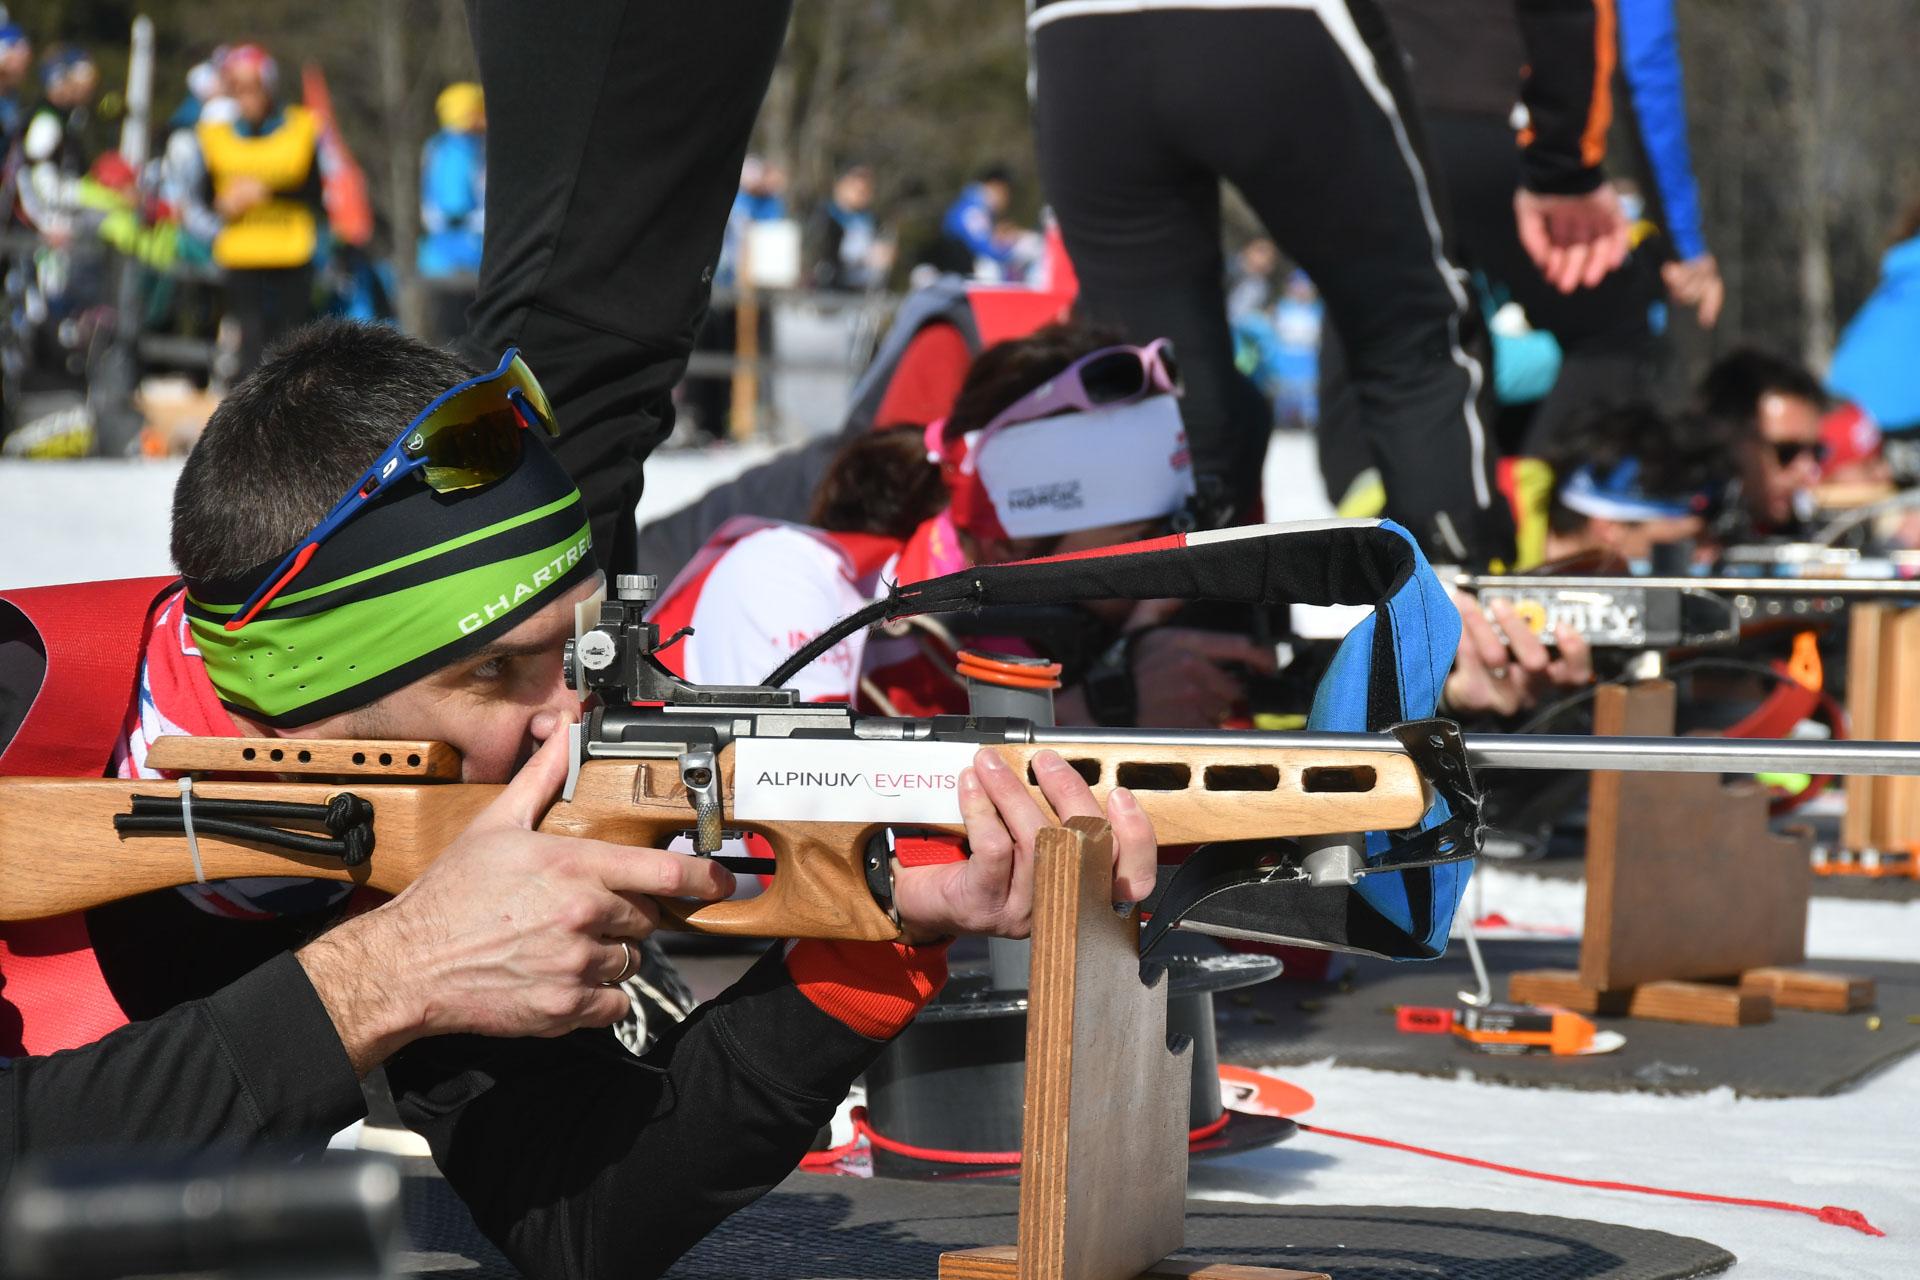 Alpinum-Biathlon-Impulse-Tour-2019©JulieRuly_211